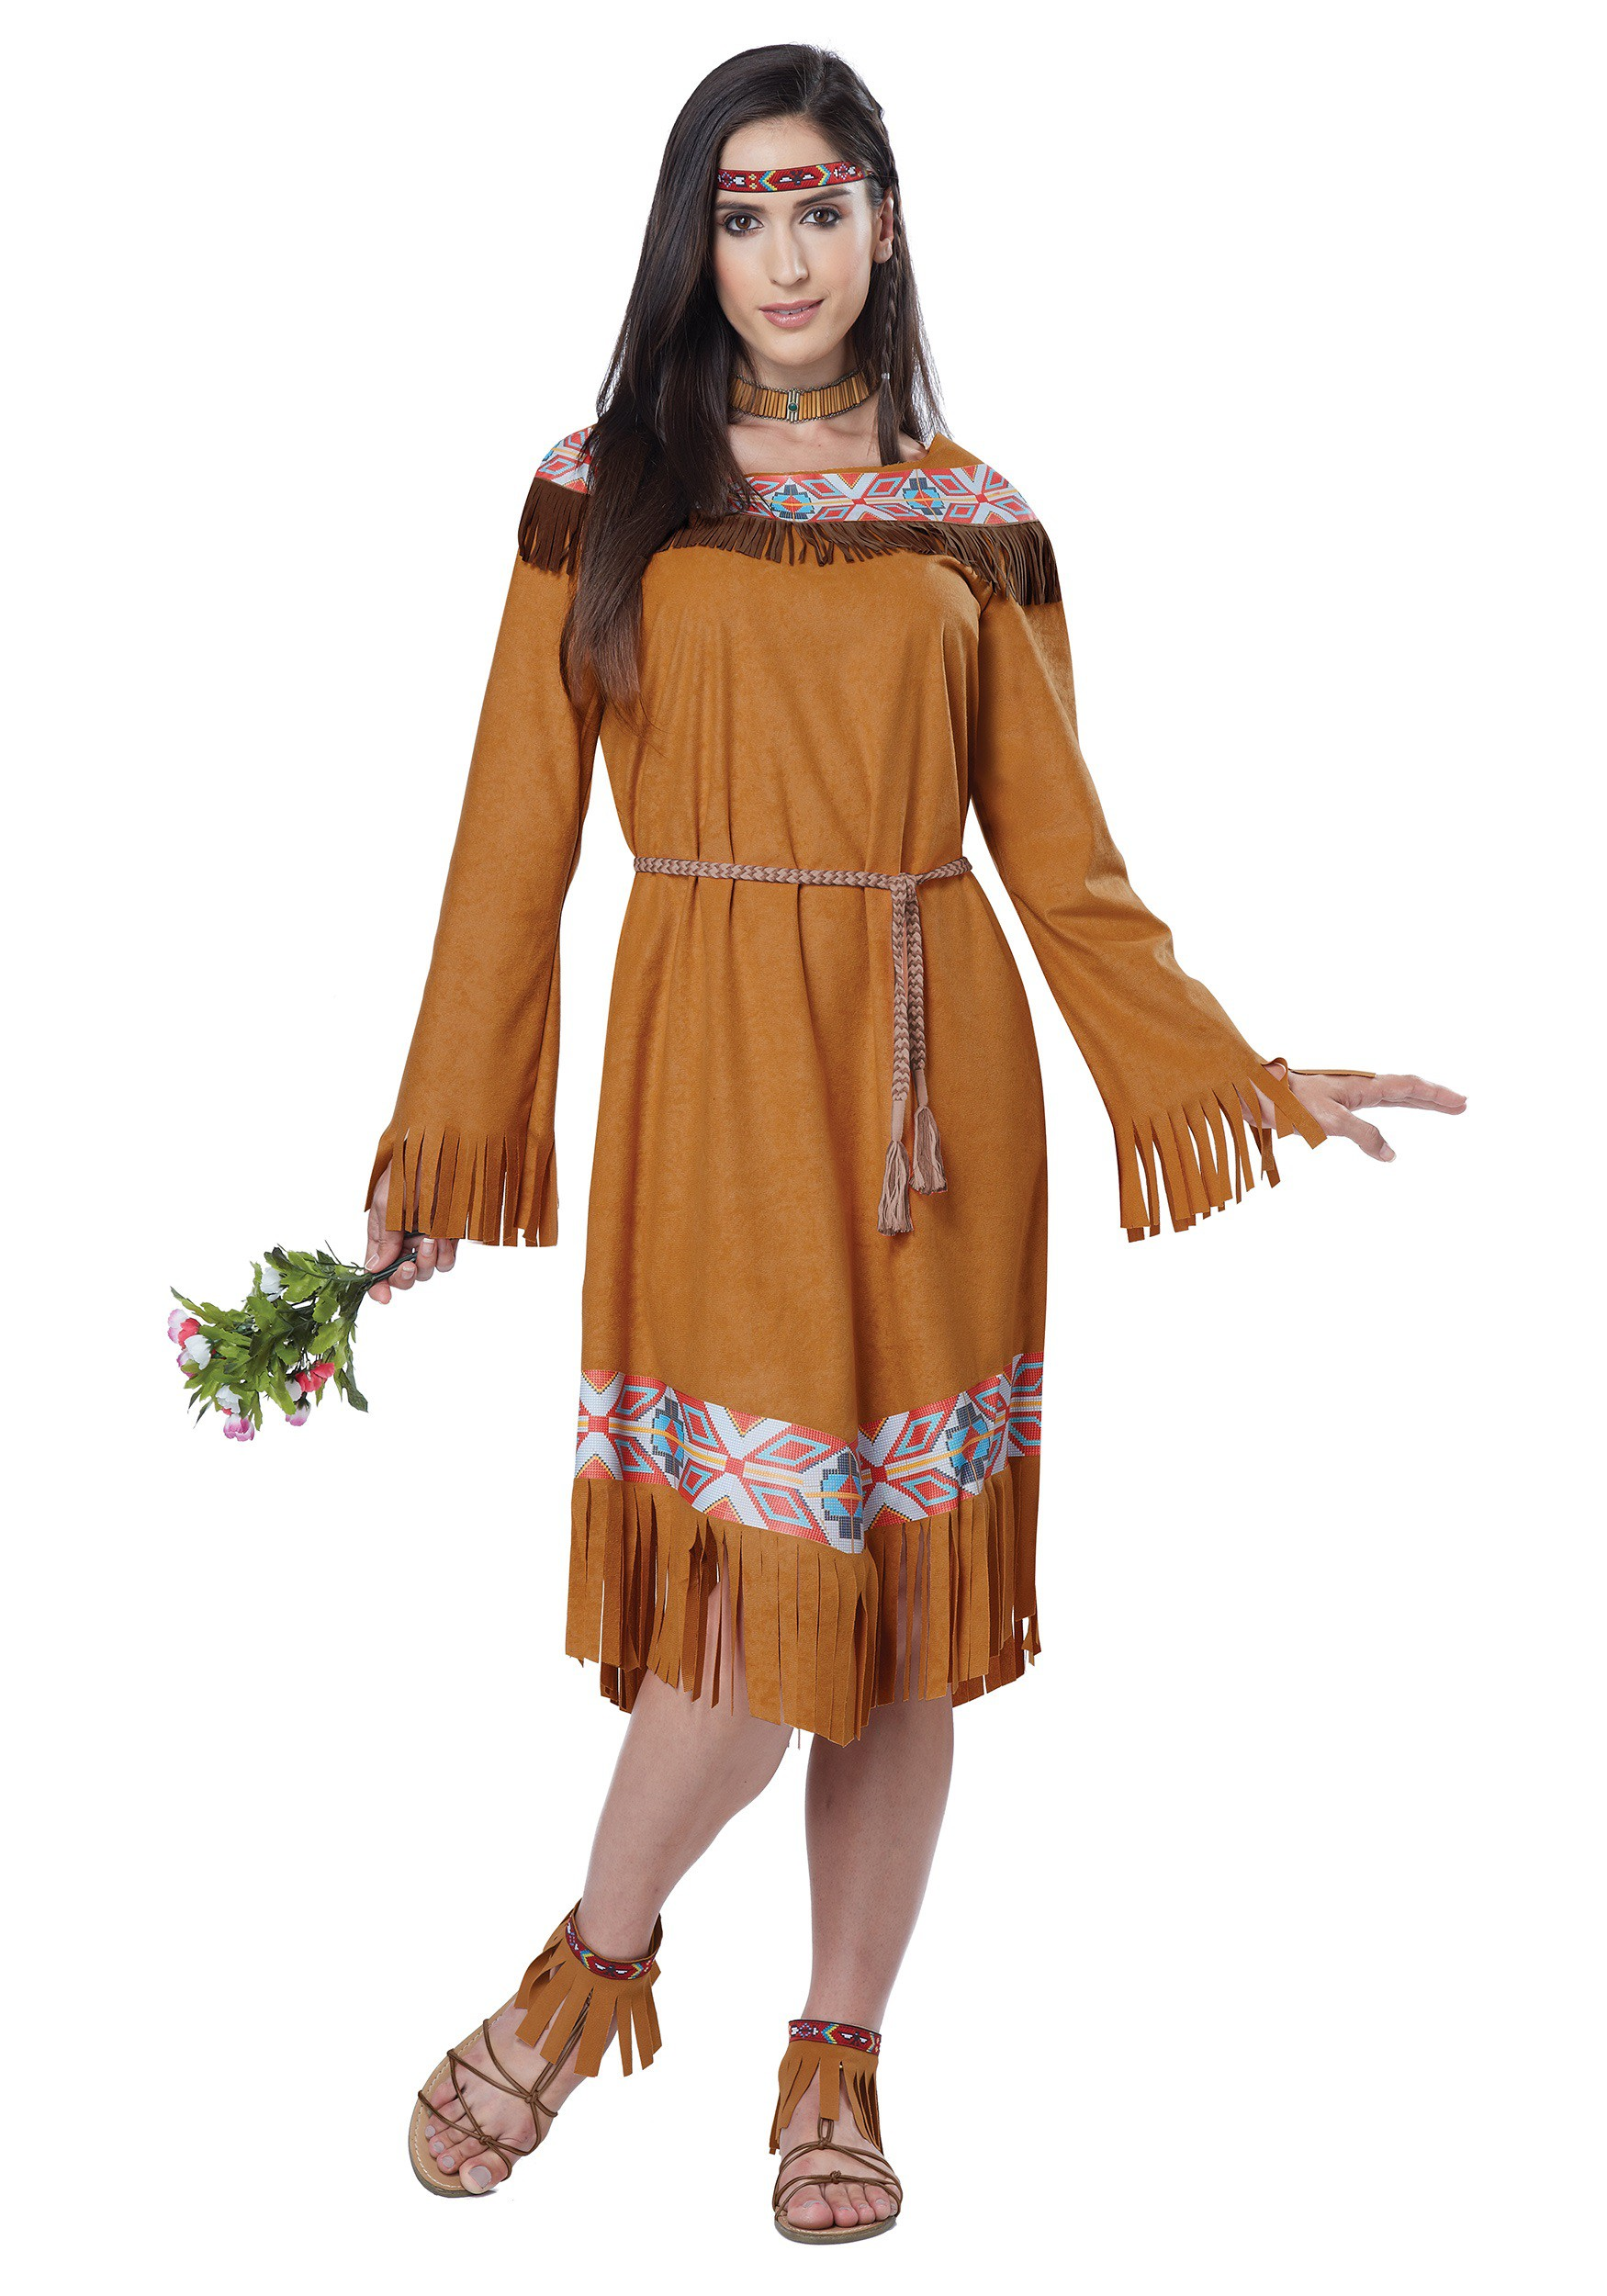 costume maiden Native american